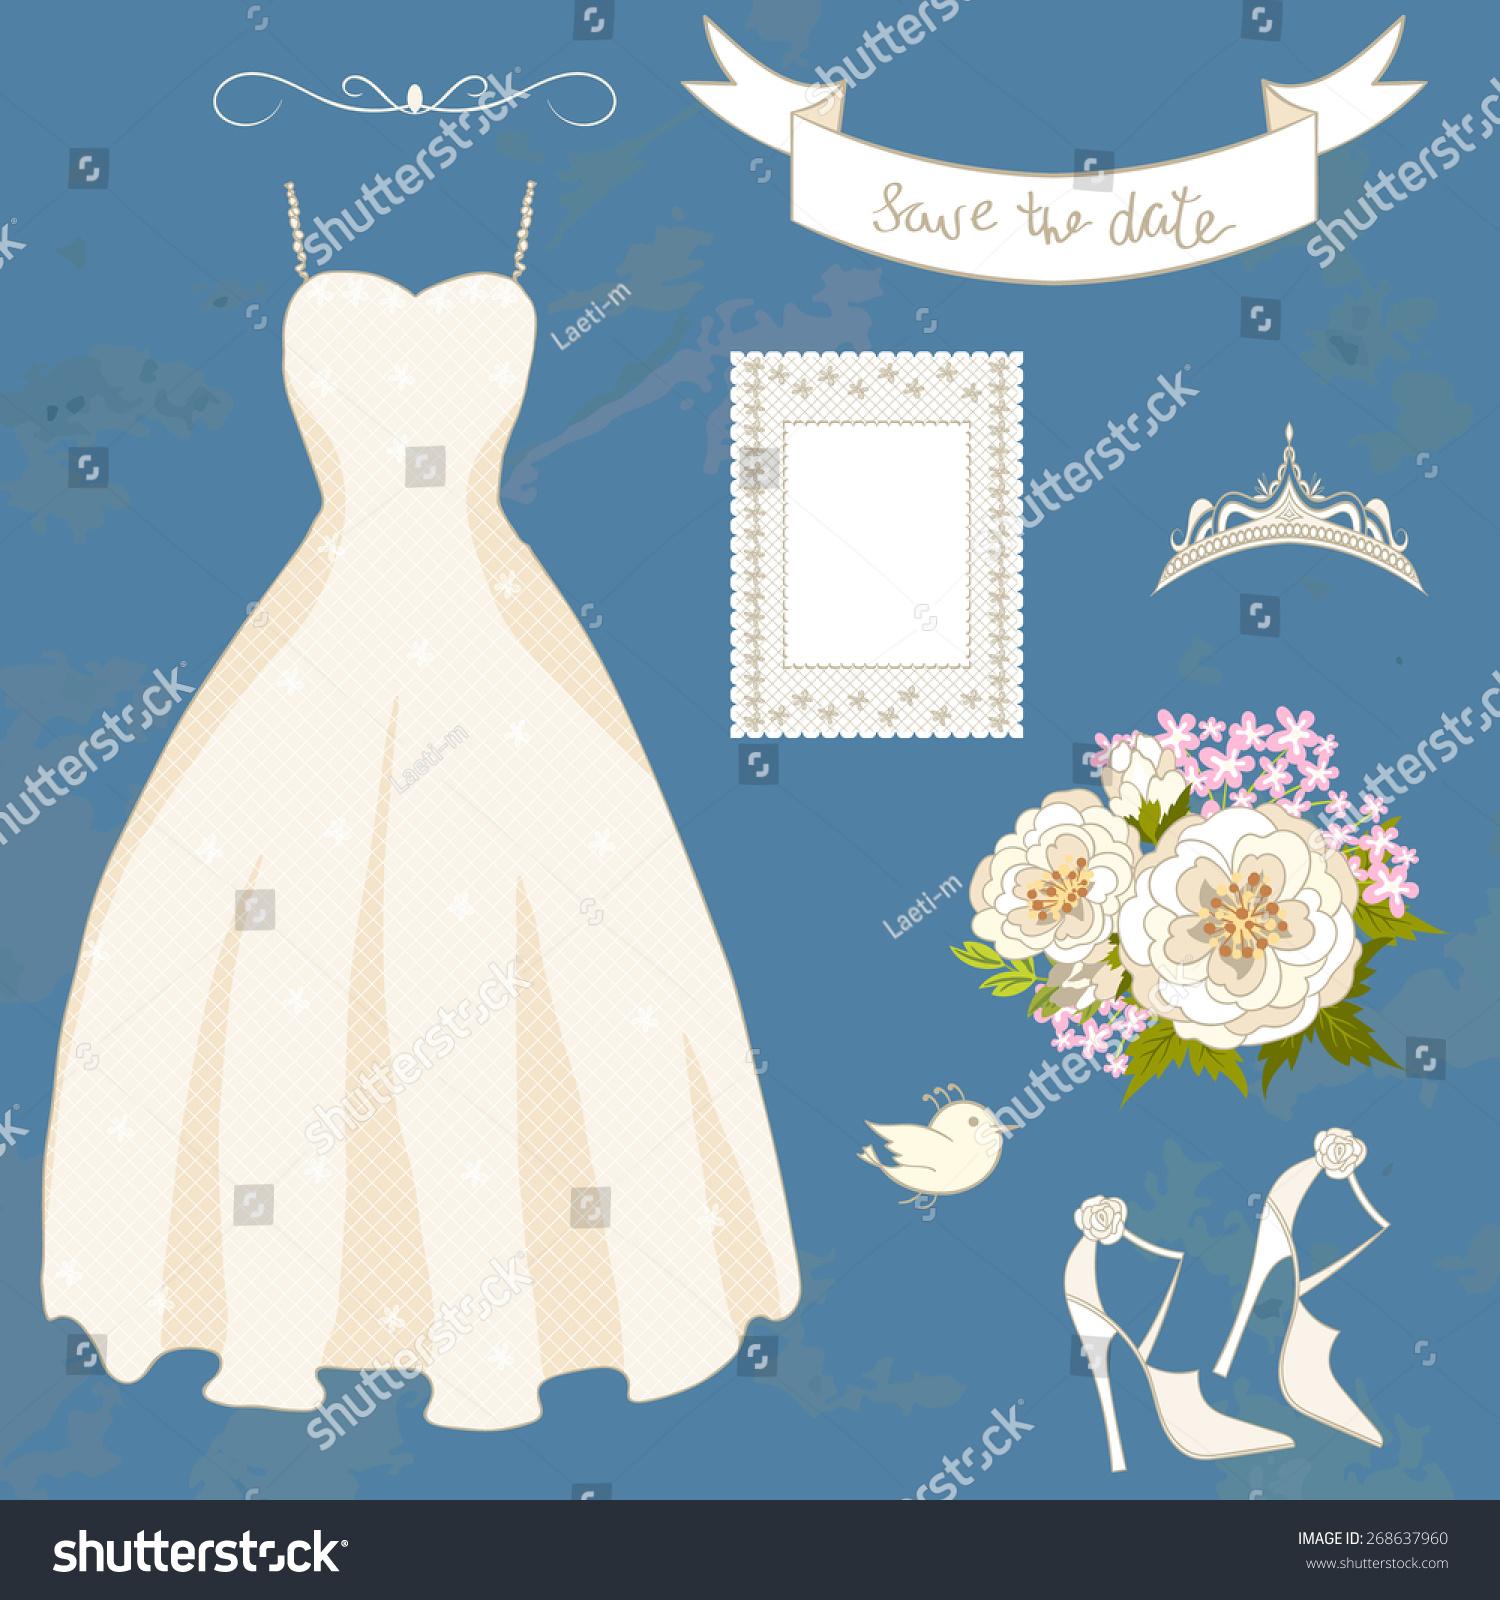 Wedding Set Accessories Bride Dress Shoes Stock Photo (Photo, Vector ...